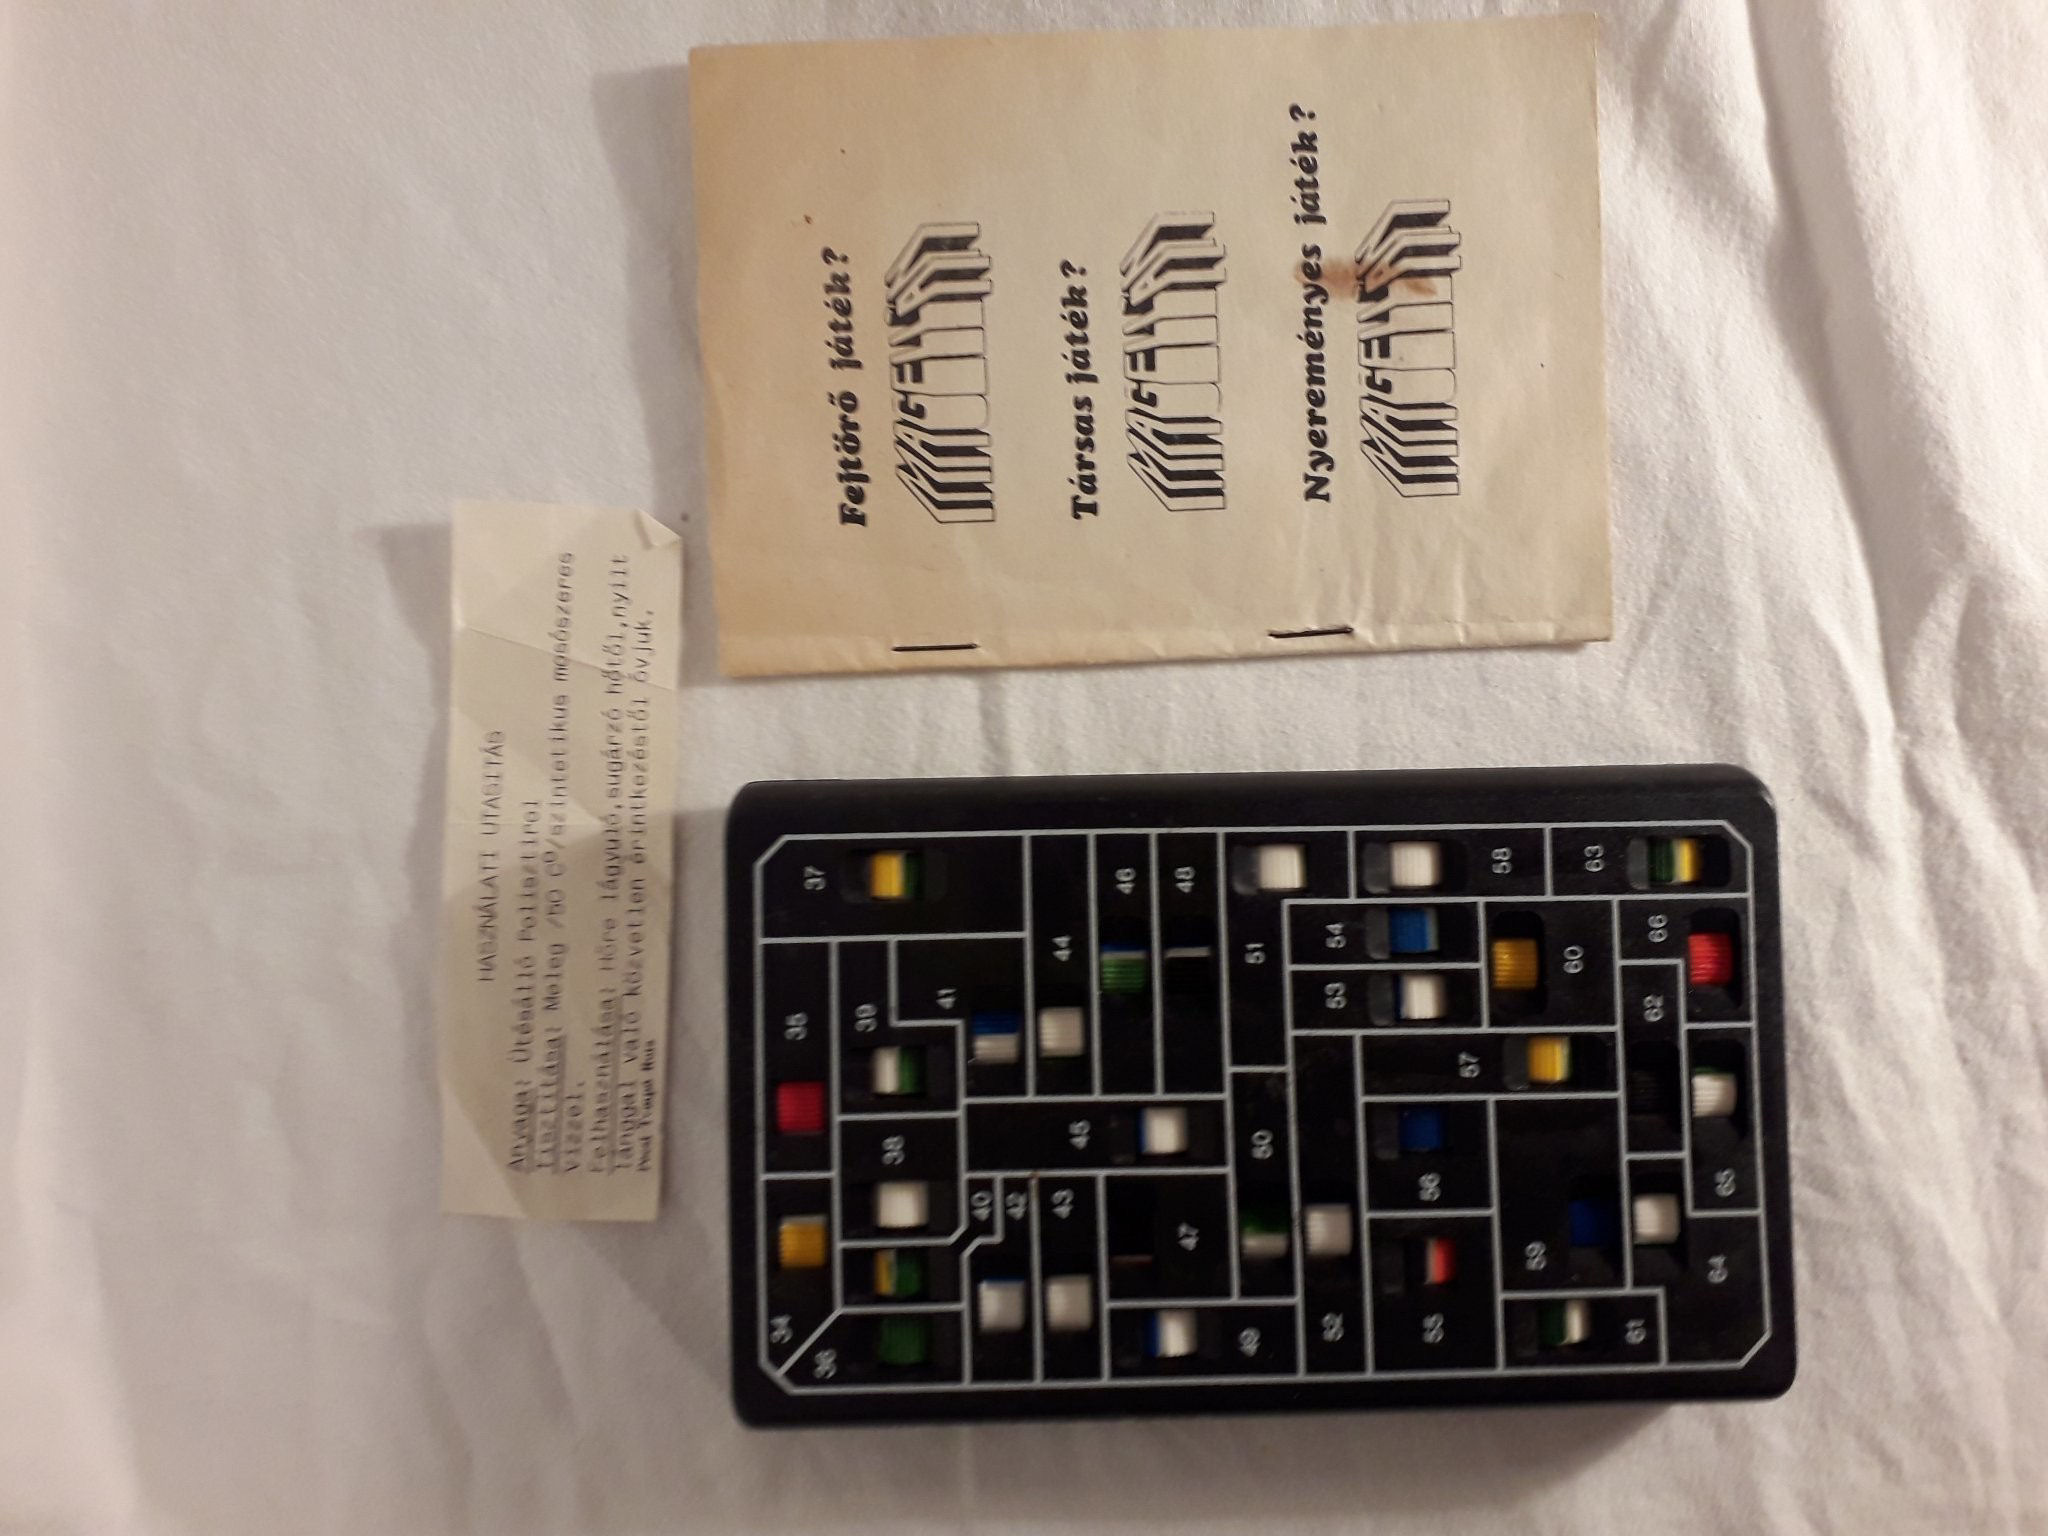 dd4d233f943afa6b3f85a96dd789df40-magellan-retro-logikai-jatek-gyerekeknek-felnotteknek-1980-as-evek.jpg